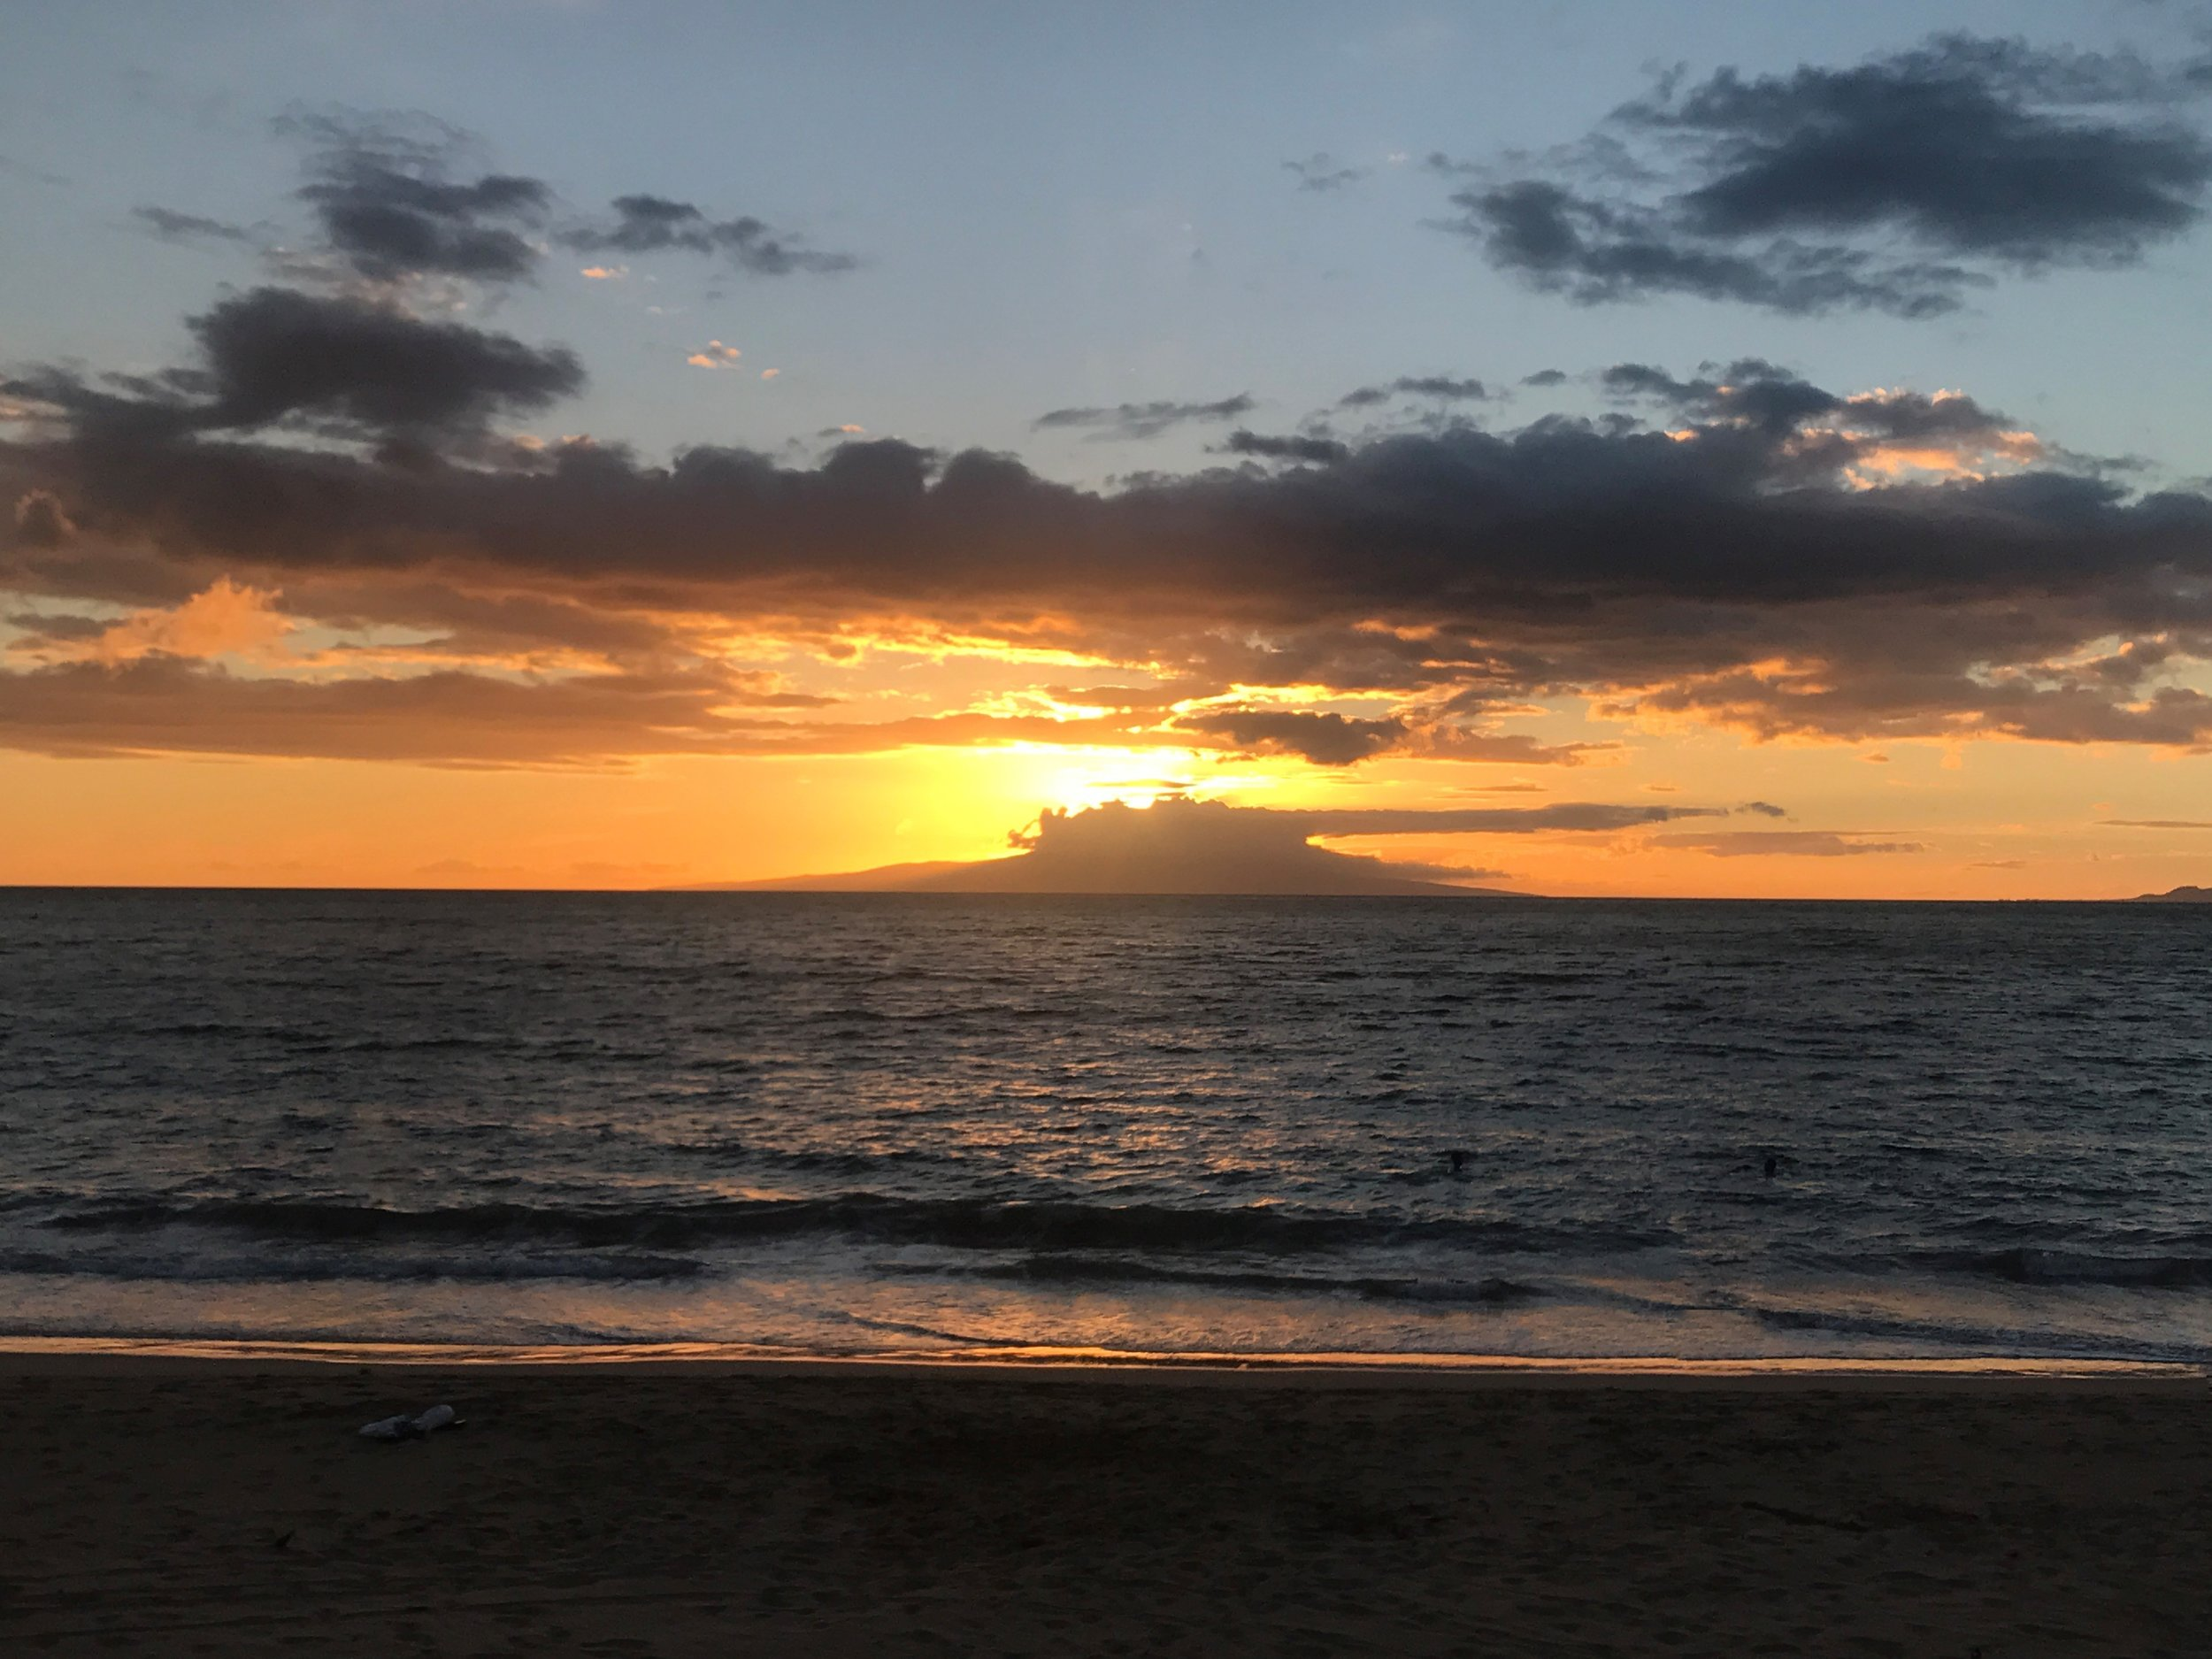 Sunset over Lanai / warporweft.com